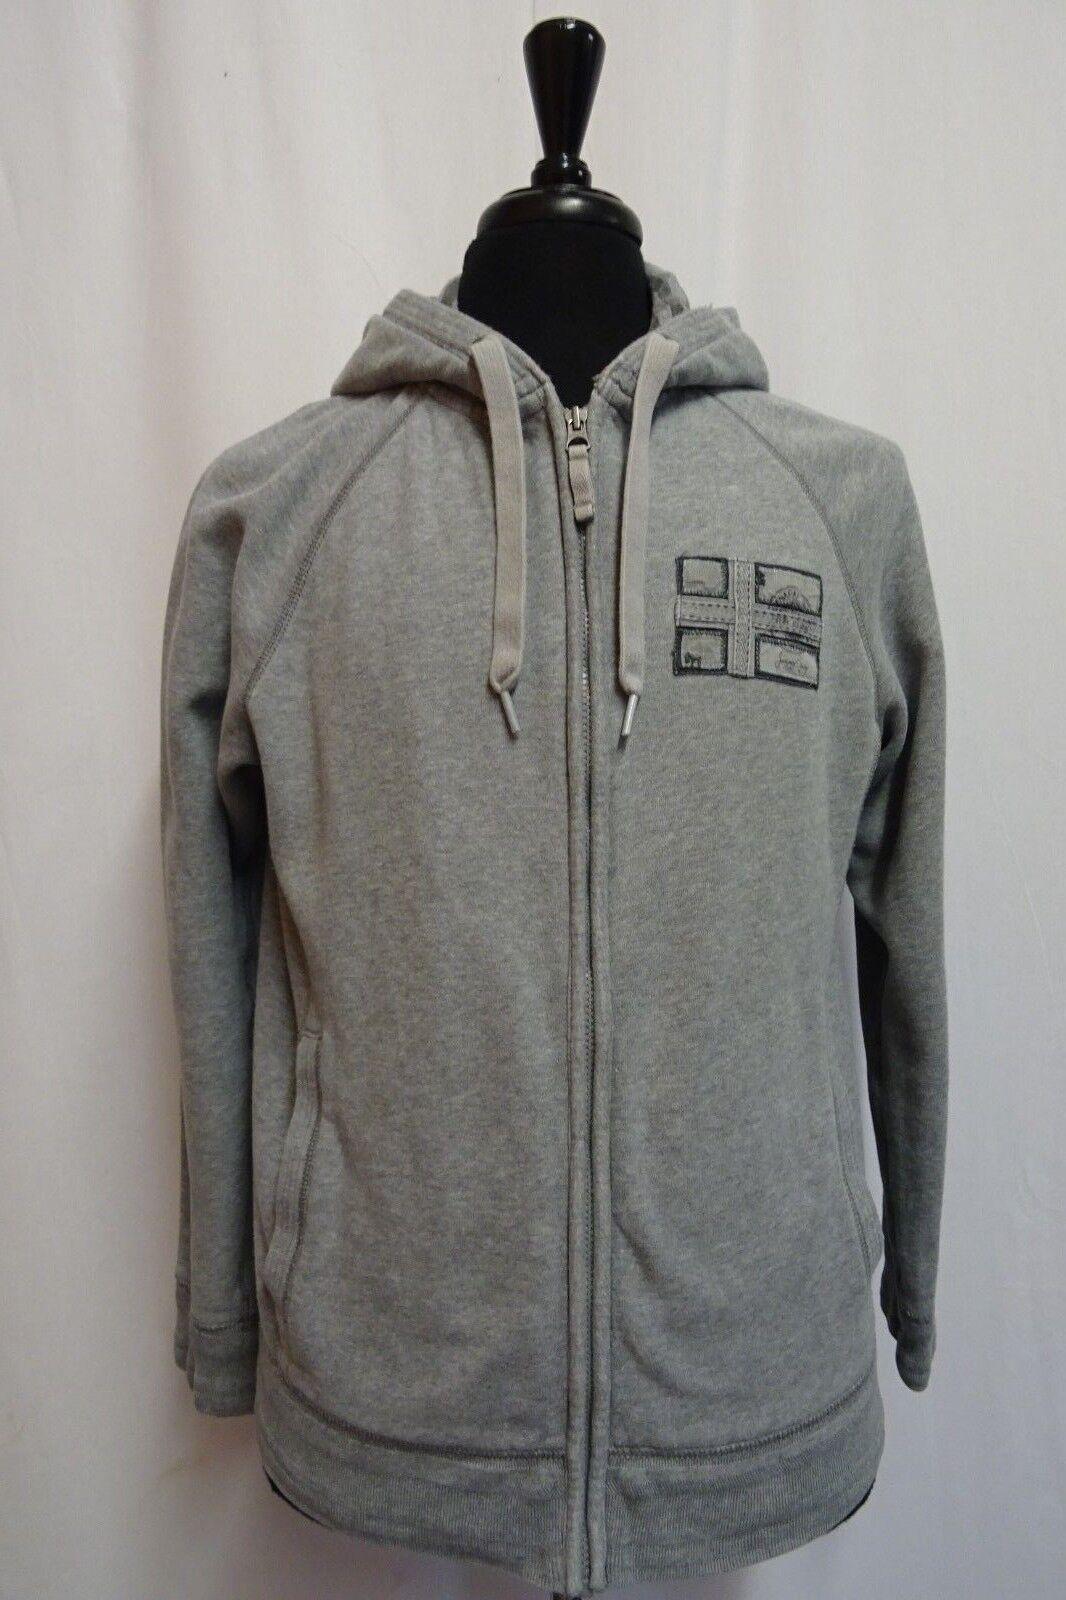 Men's Napapijri Hooded Jumpers & Cardigans Size (L) KB844